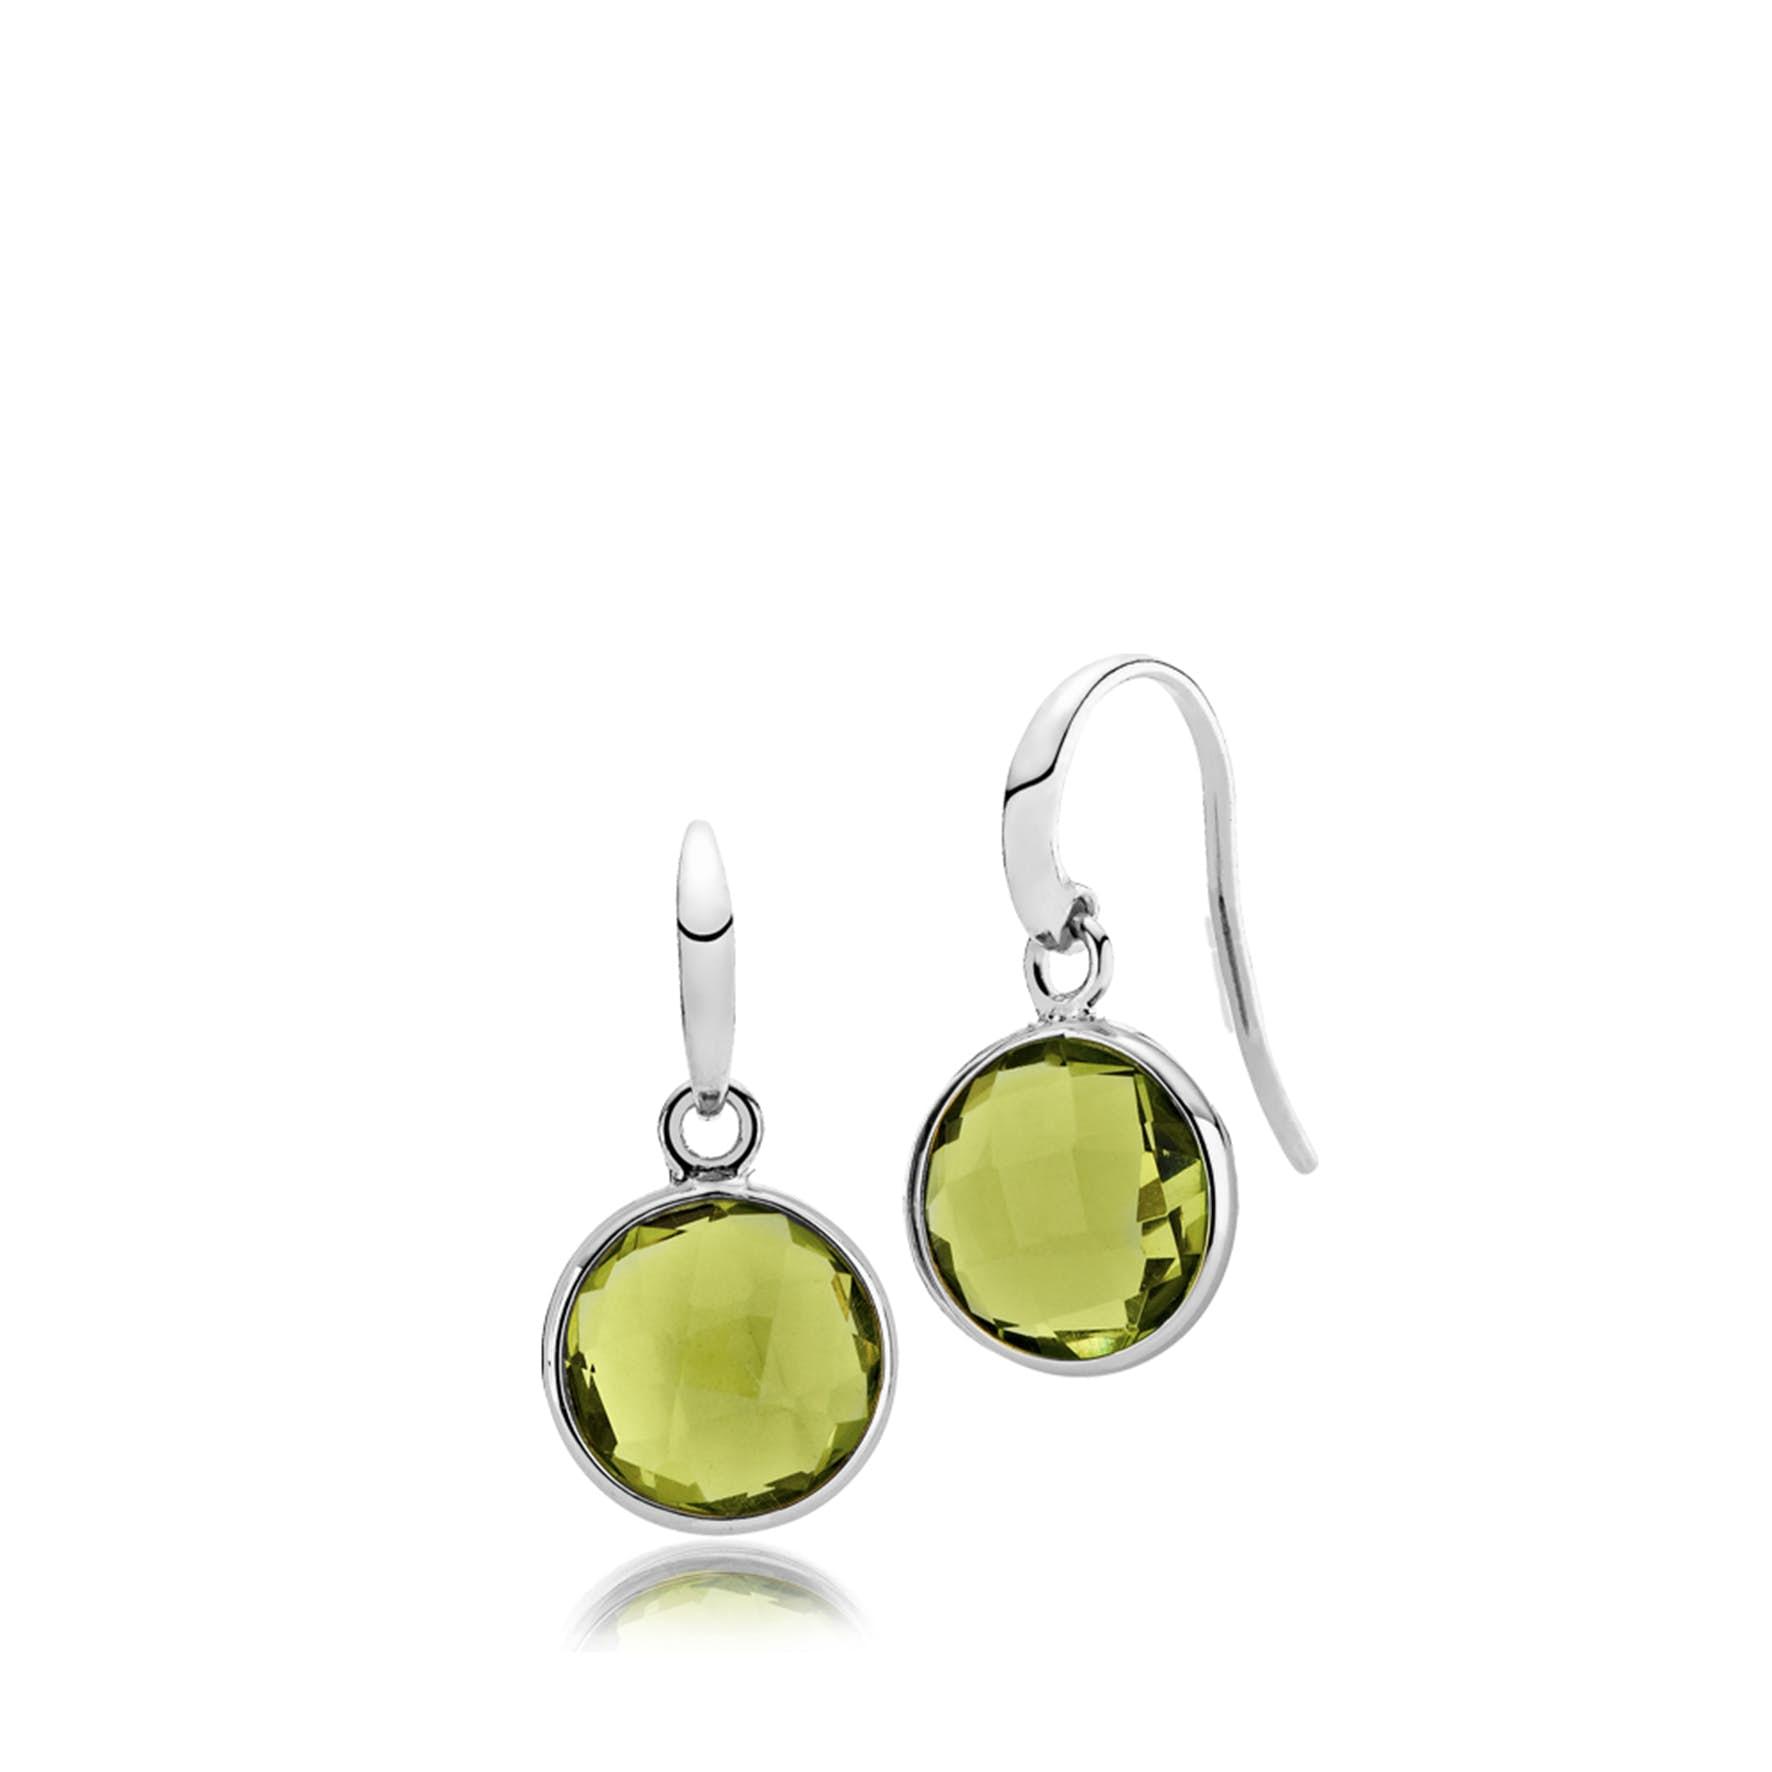 Prima Donna Earrings Peridot Green from Izabel Camille in Silver Sterling 925|Peridot Green